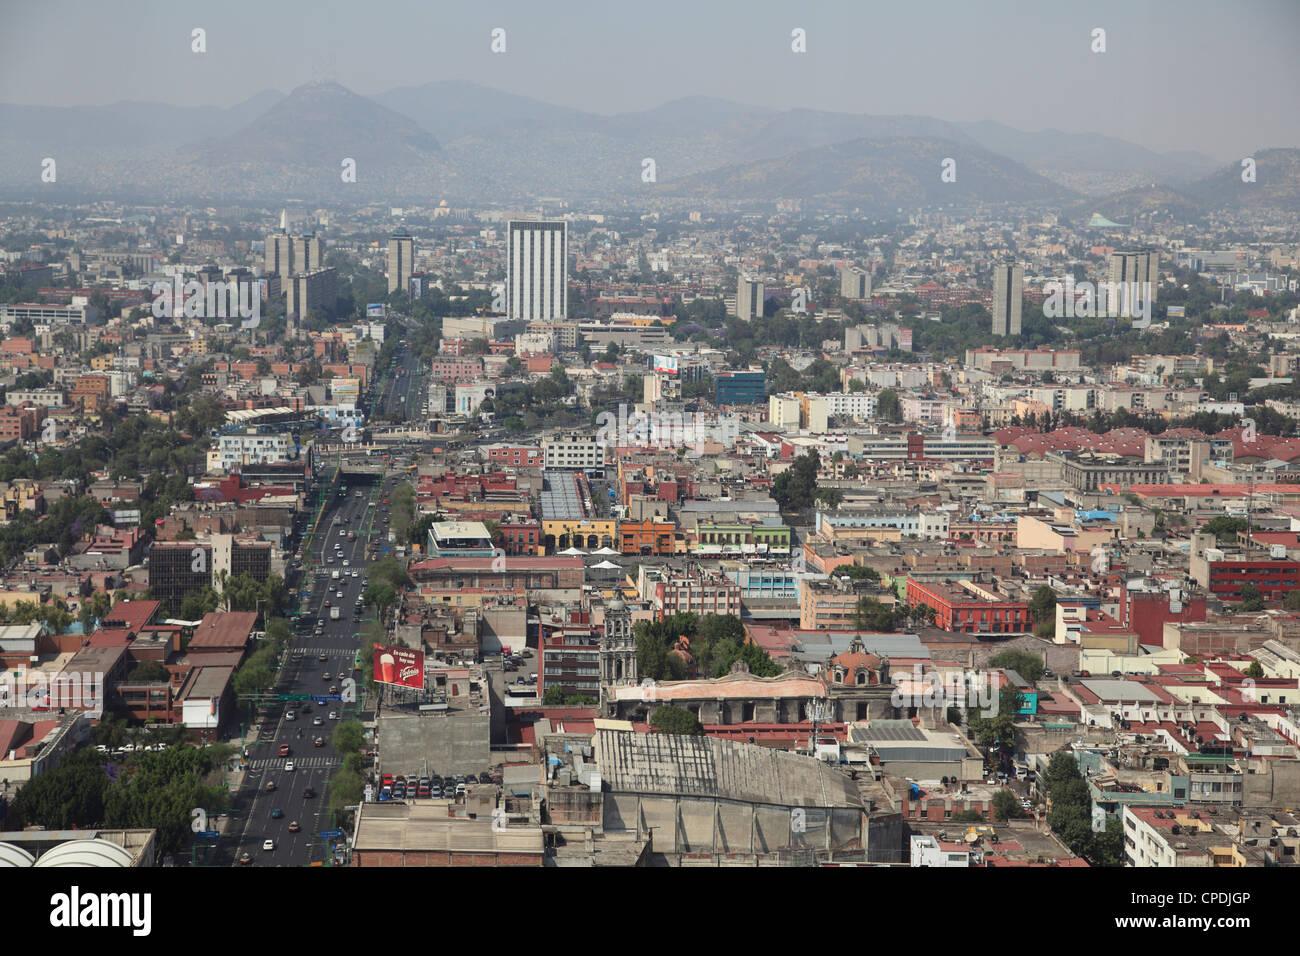 View over Mexico City Center, Mexico City, Mexico, North America - Stock Image